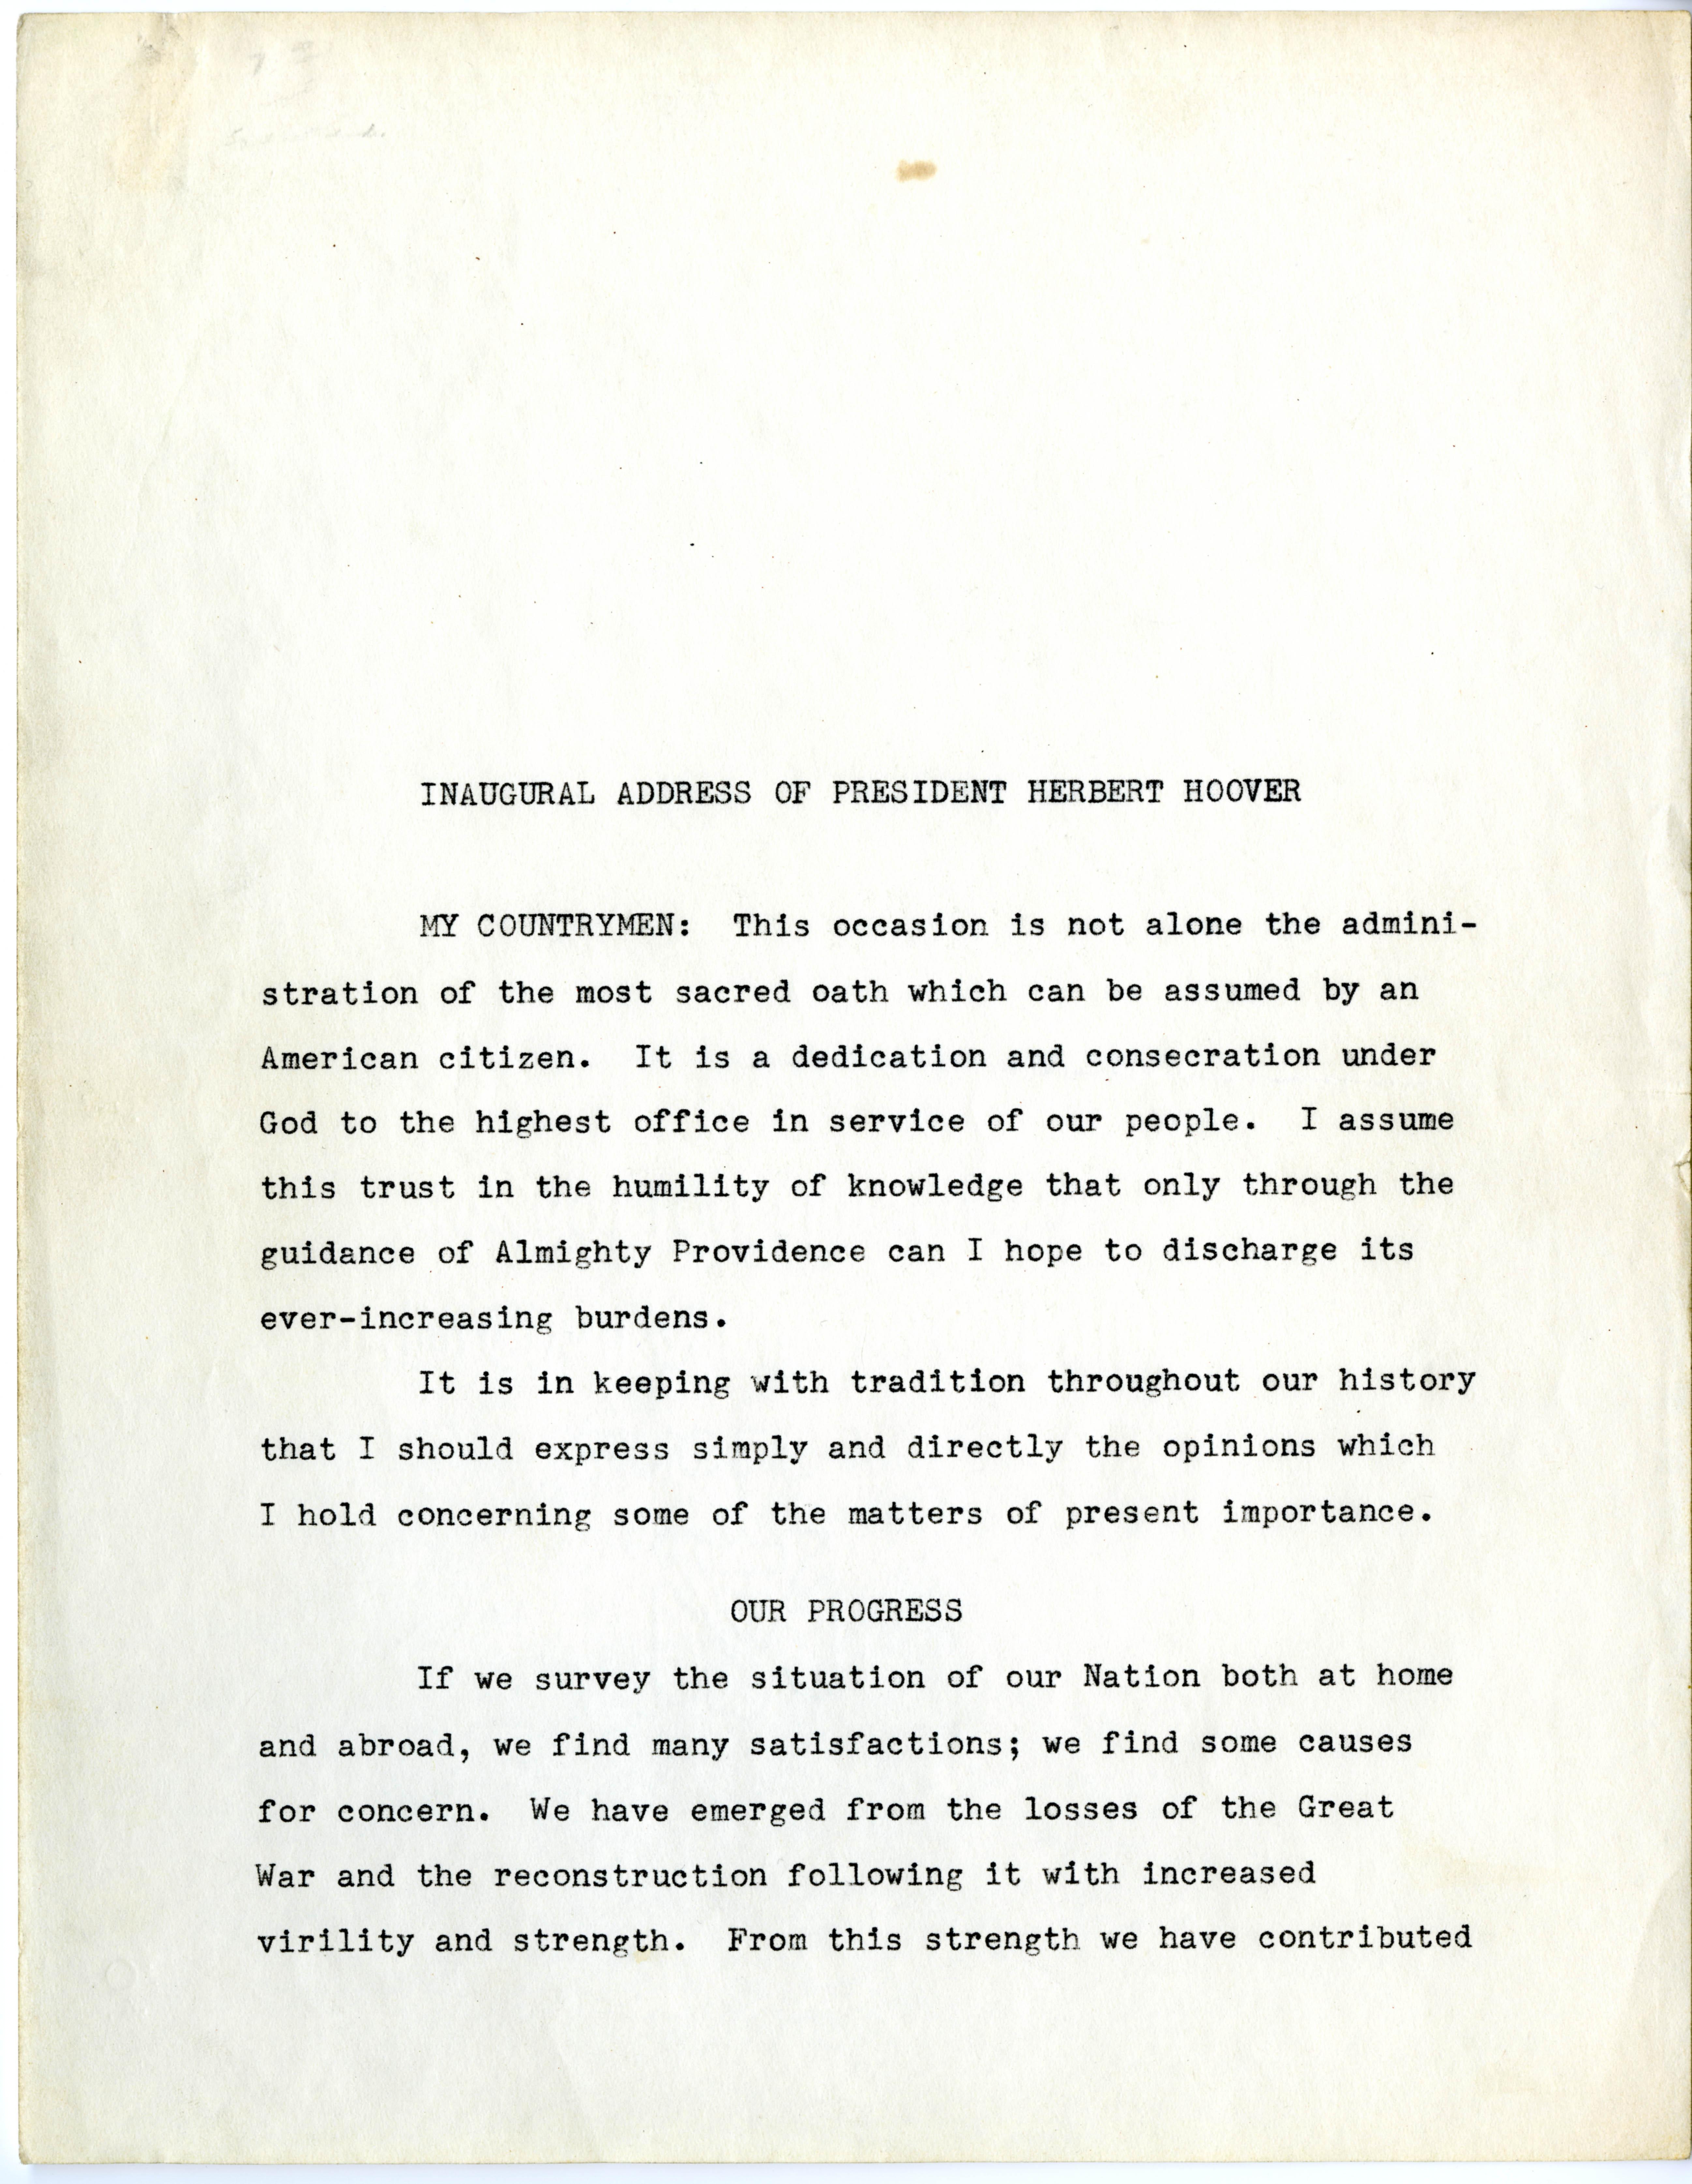 Inaugural Address of President Herbert Hoover, March 4, 1929 (Gilder Lehrman Col